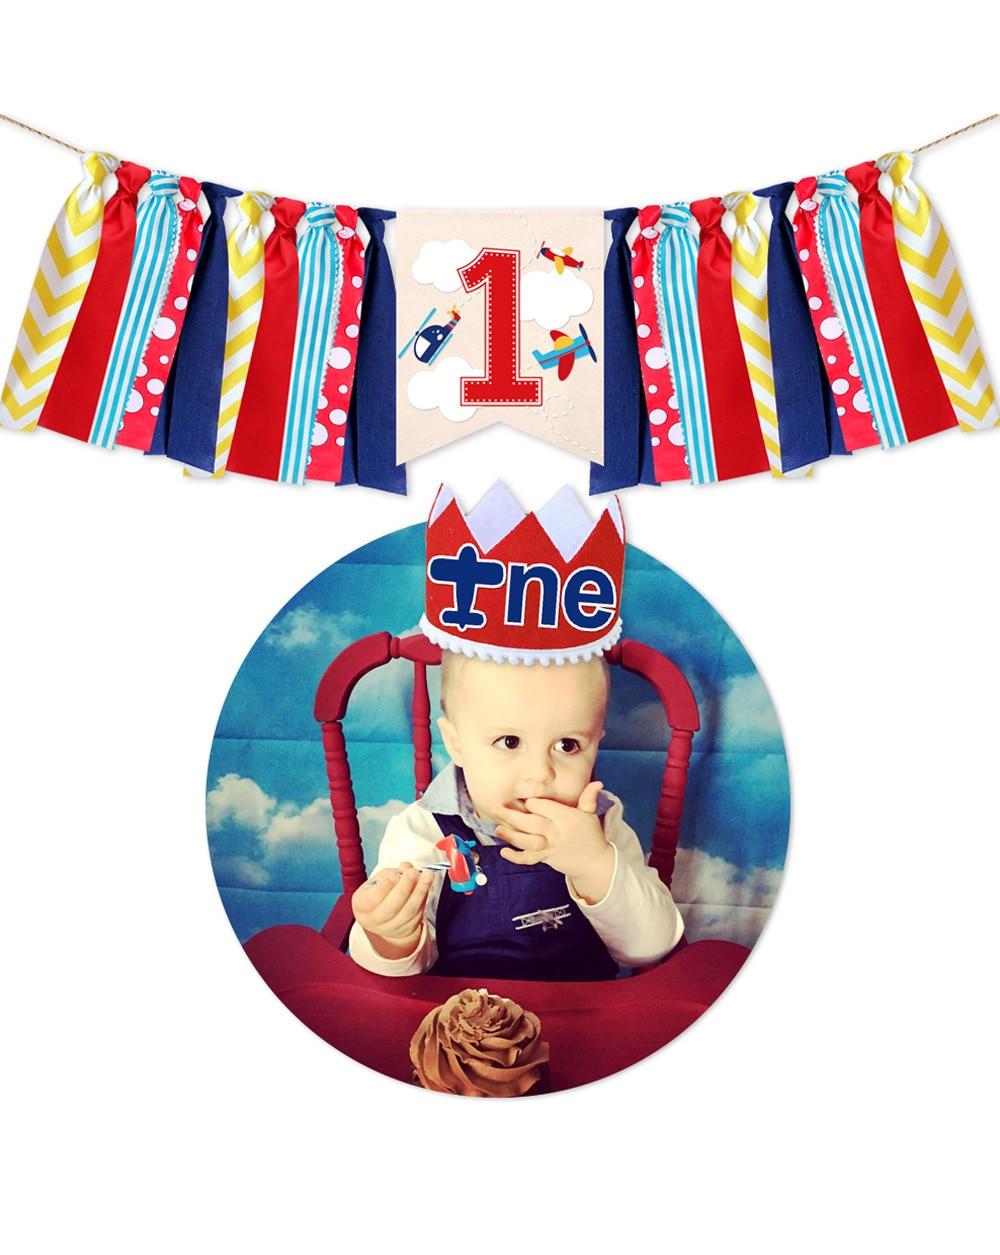 Airplane Theme Baby Birthday Birthday Flag Set Birthday Party Party Banner Decoration Supplies Anniversary Children Party Suppli